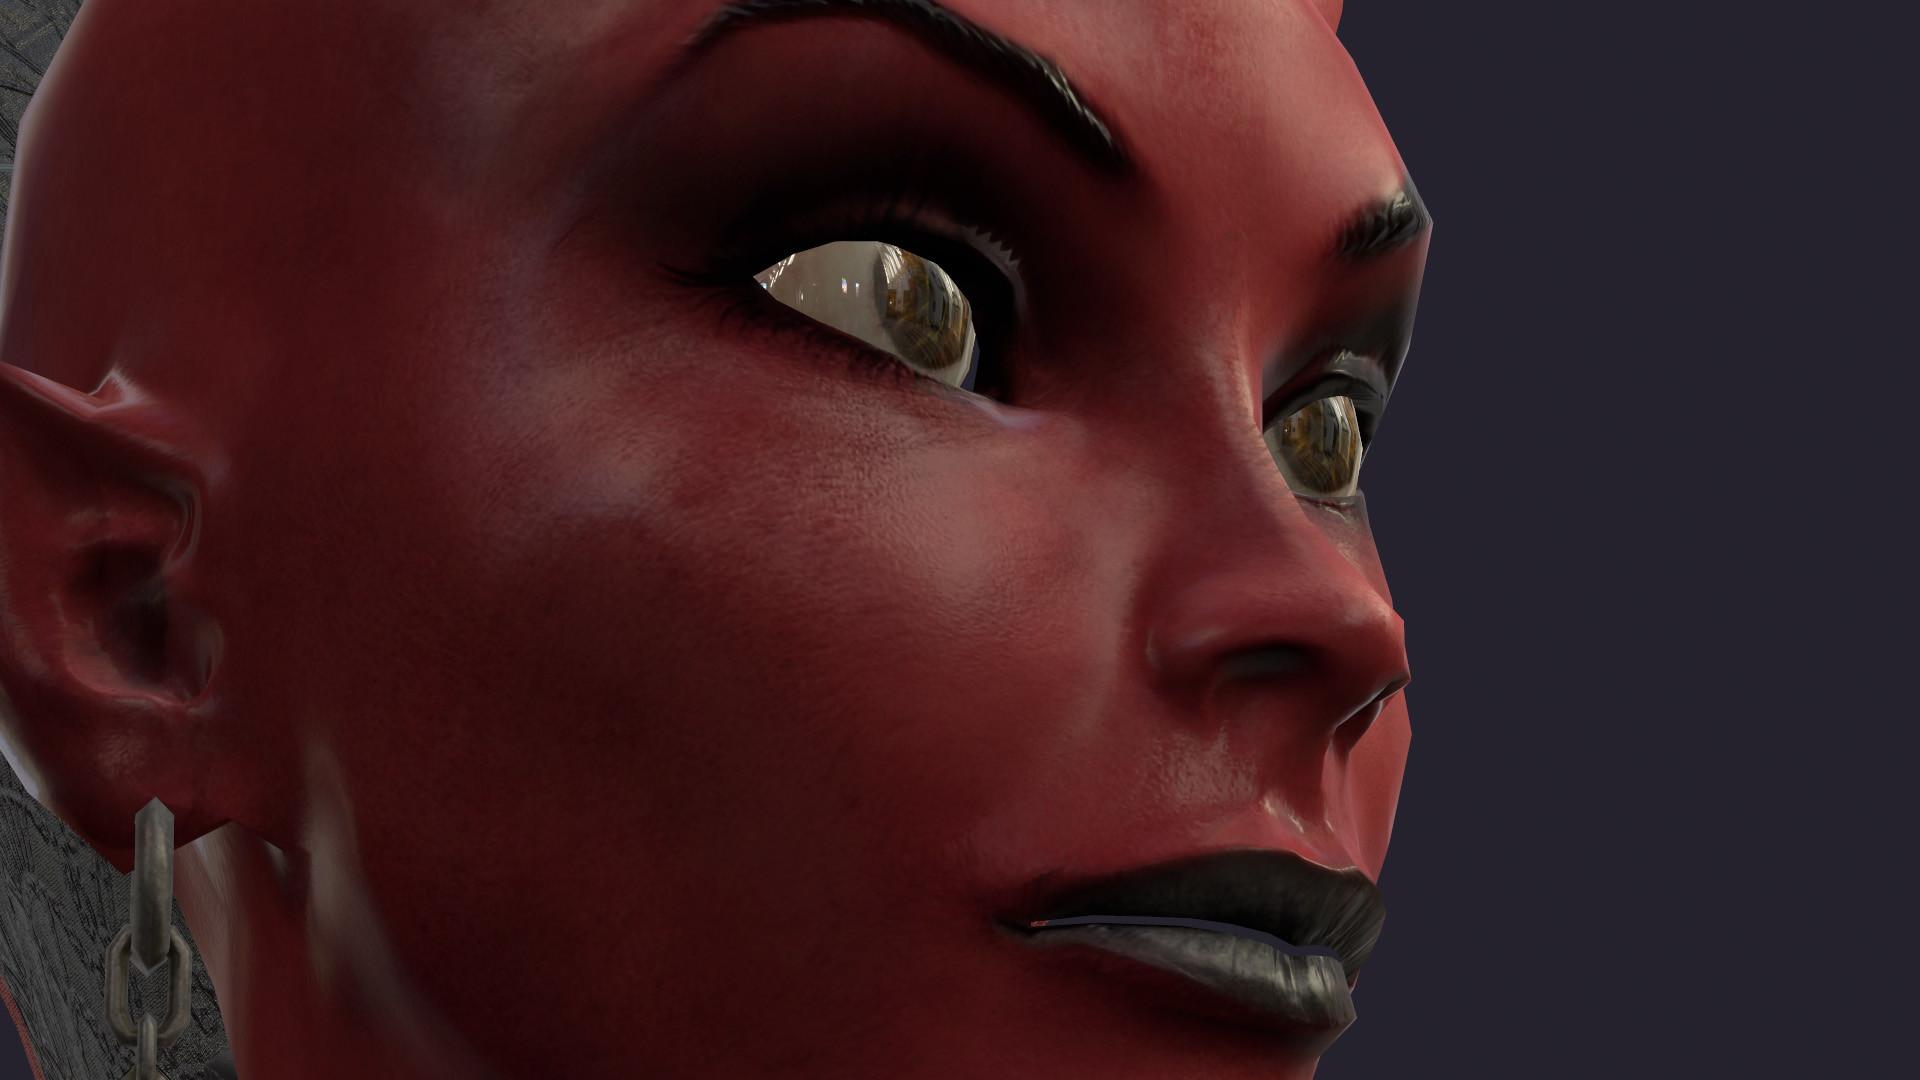 Dirk wachsmuth devilgirl screenshot04